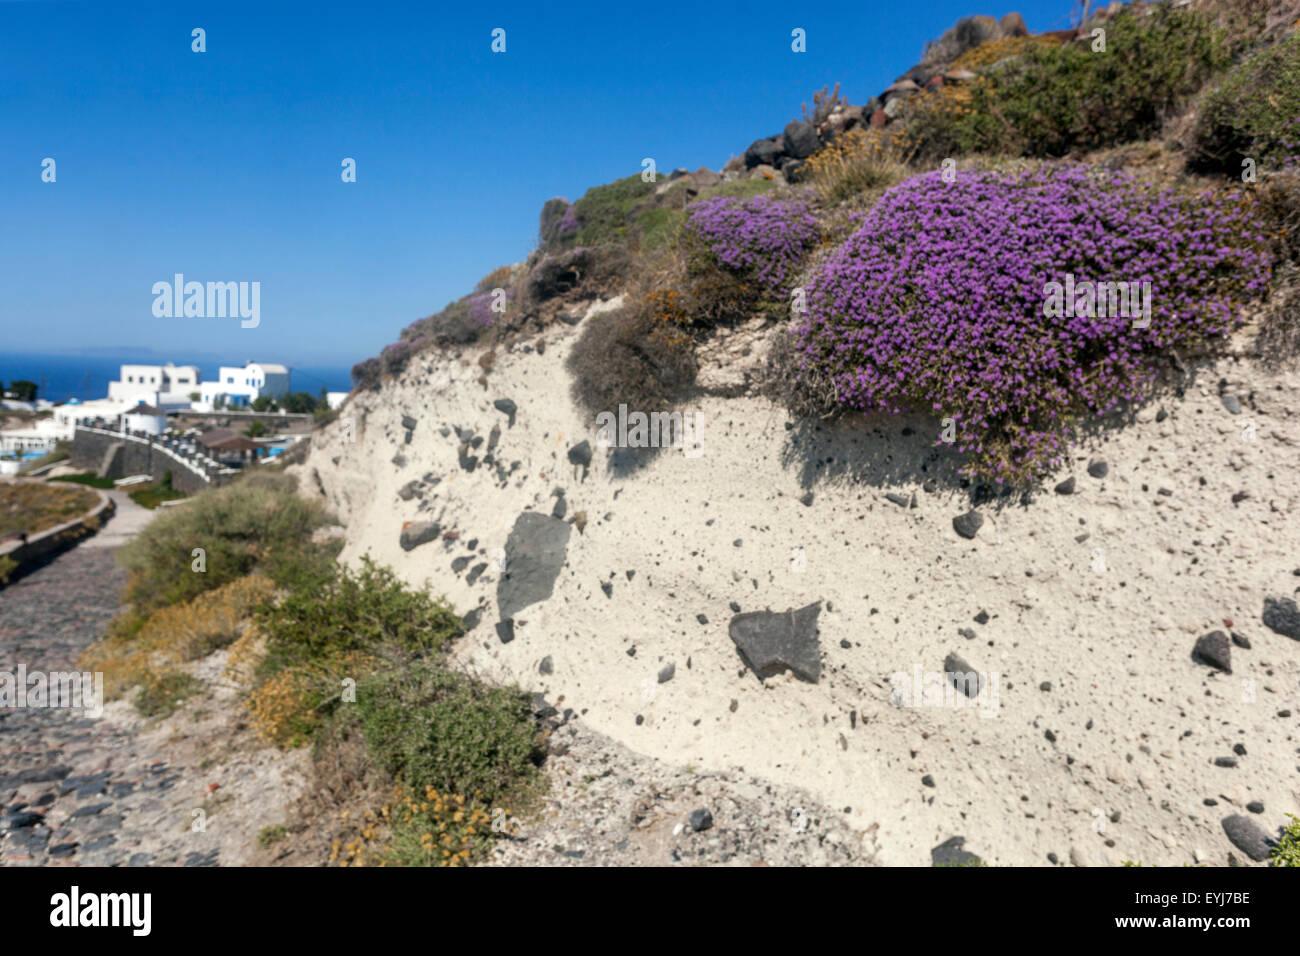 The path from Imerovigli to Oia, pumice profile, Santorini, Greek Islands, Cyclades, Greece, EU, Europa - Stock Image